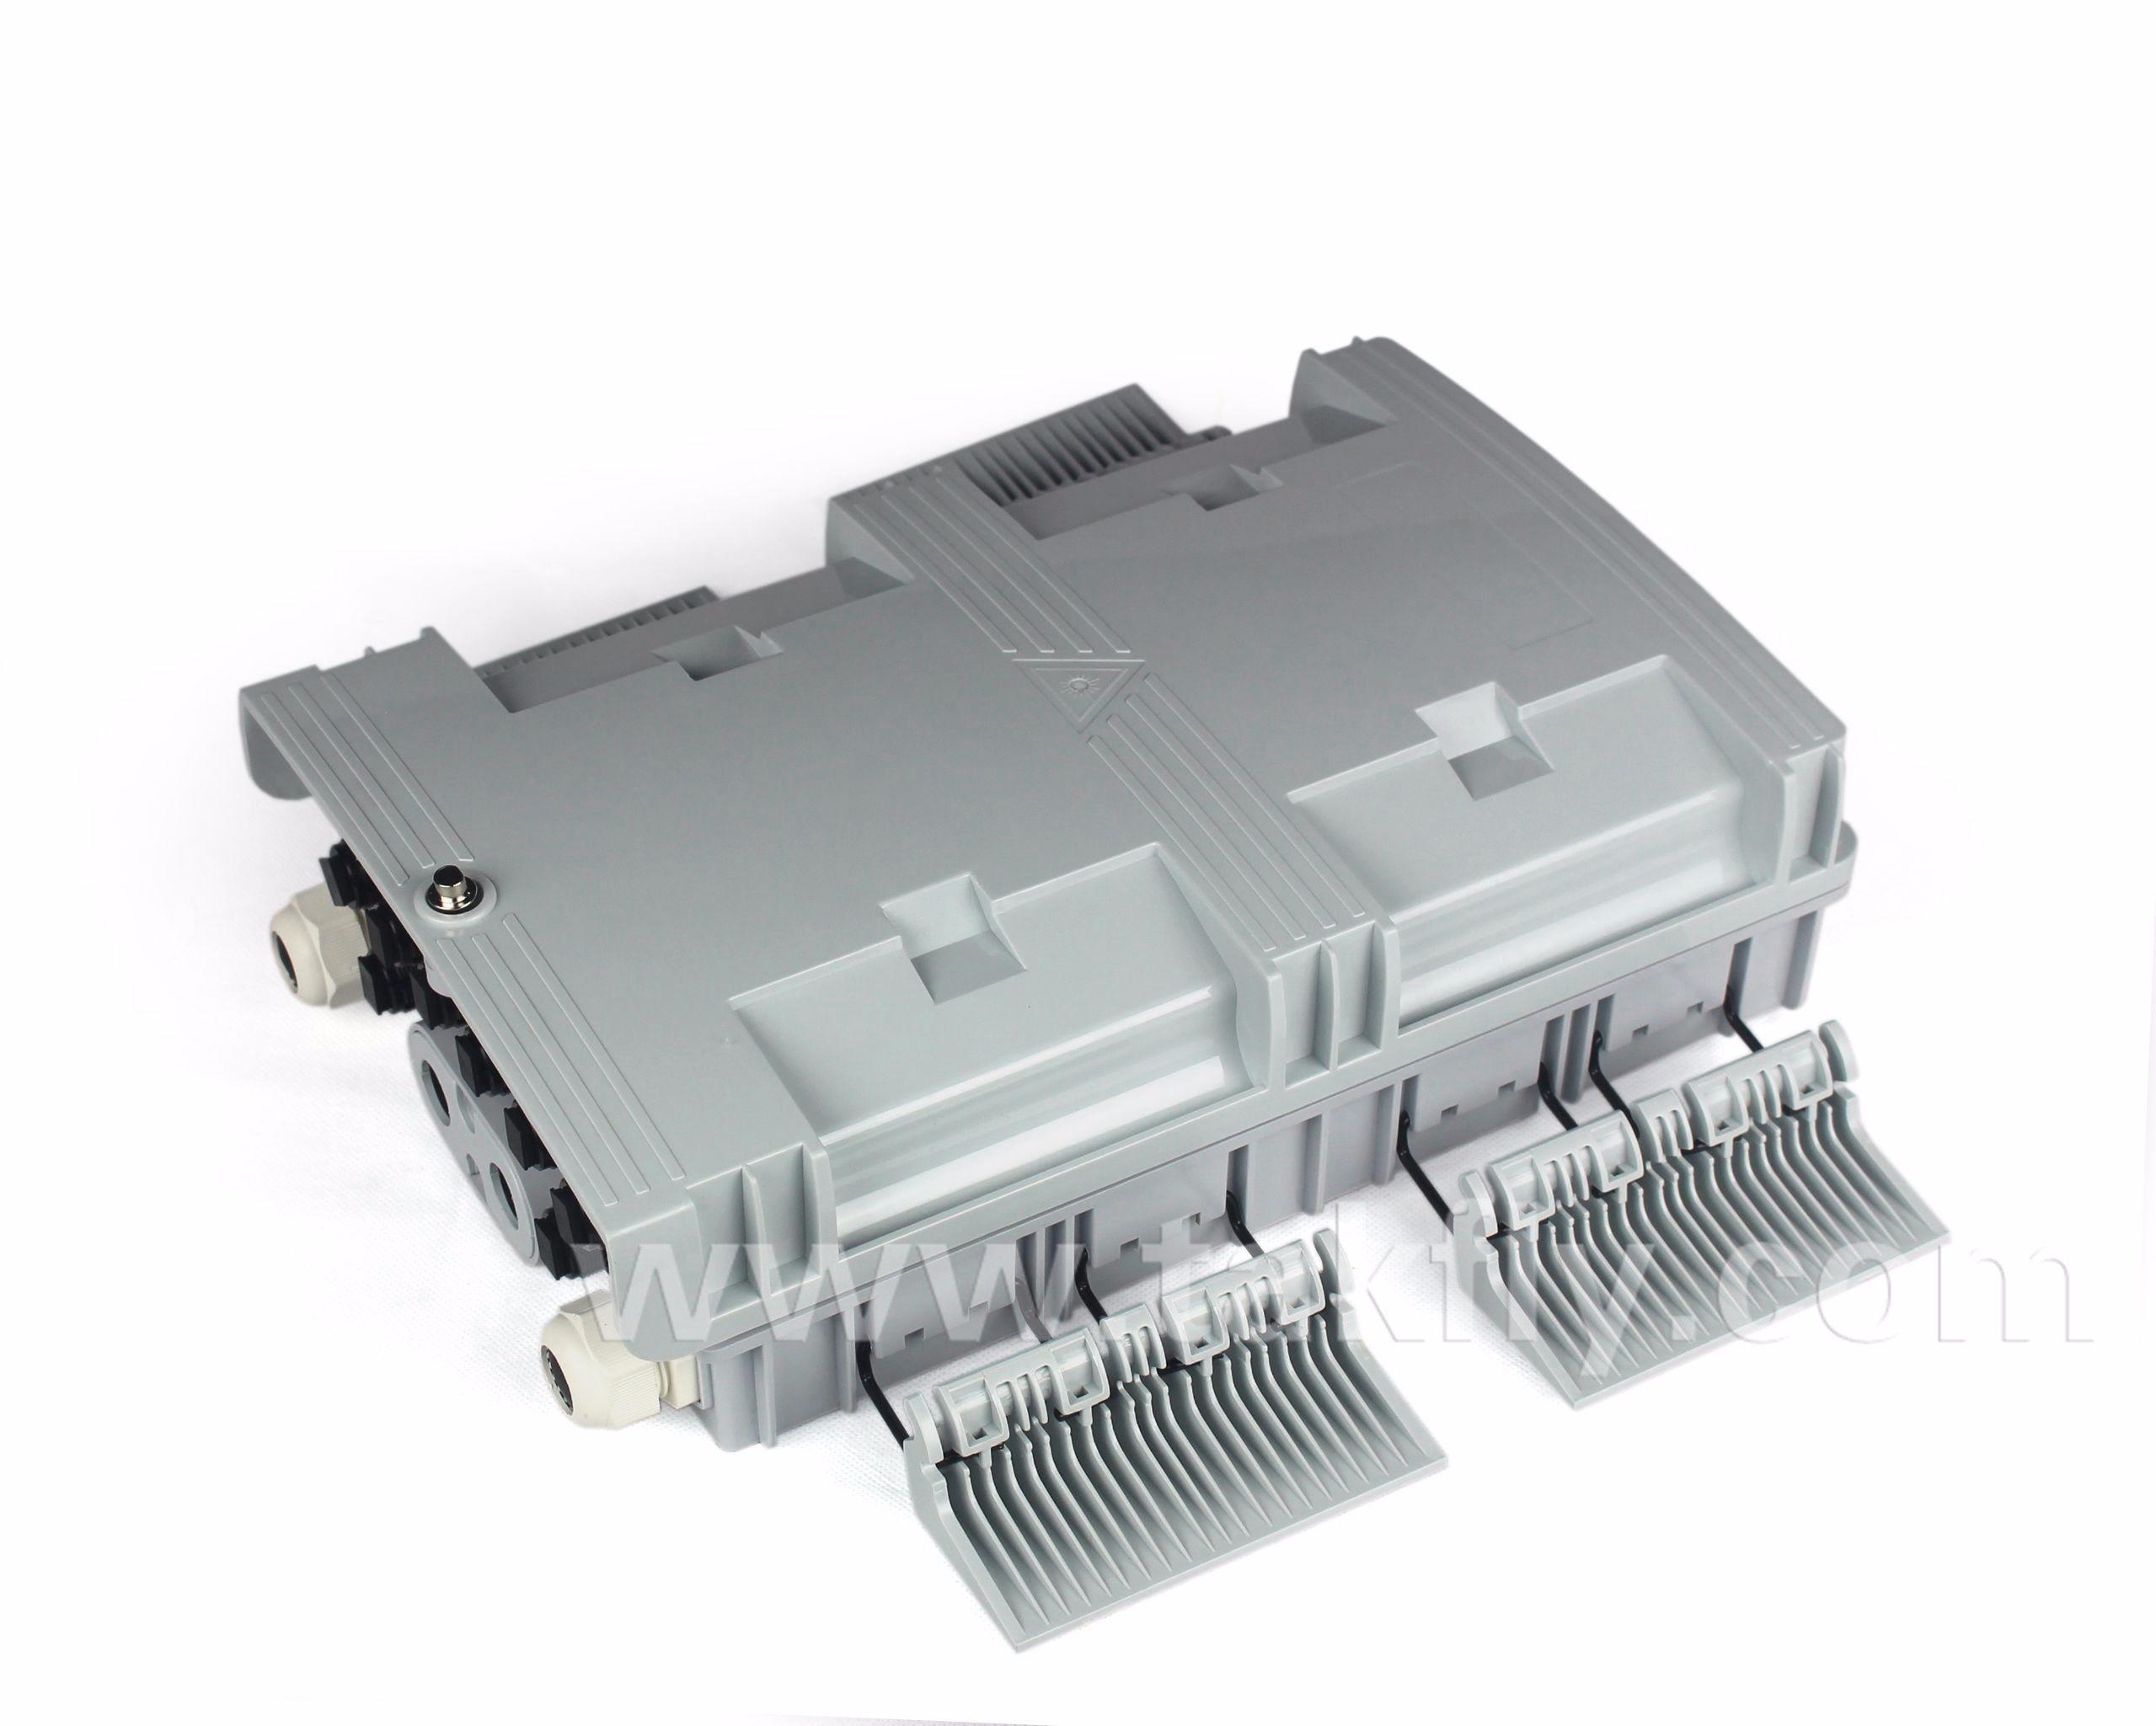 FTTH 8 Ports Waterproof Fiber Optic Terminal Box